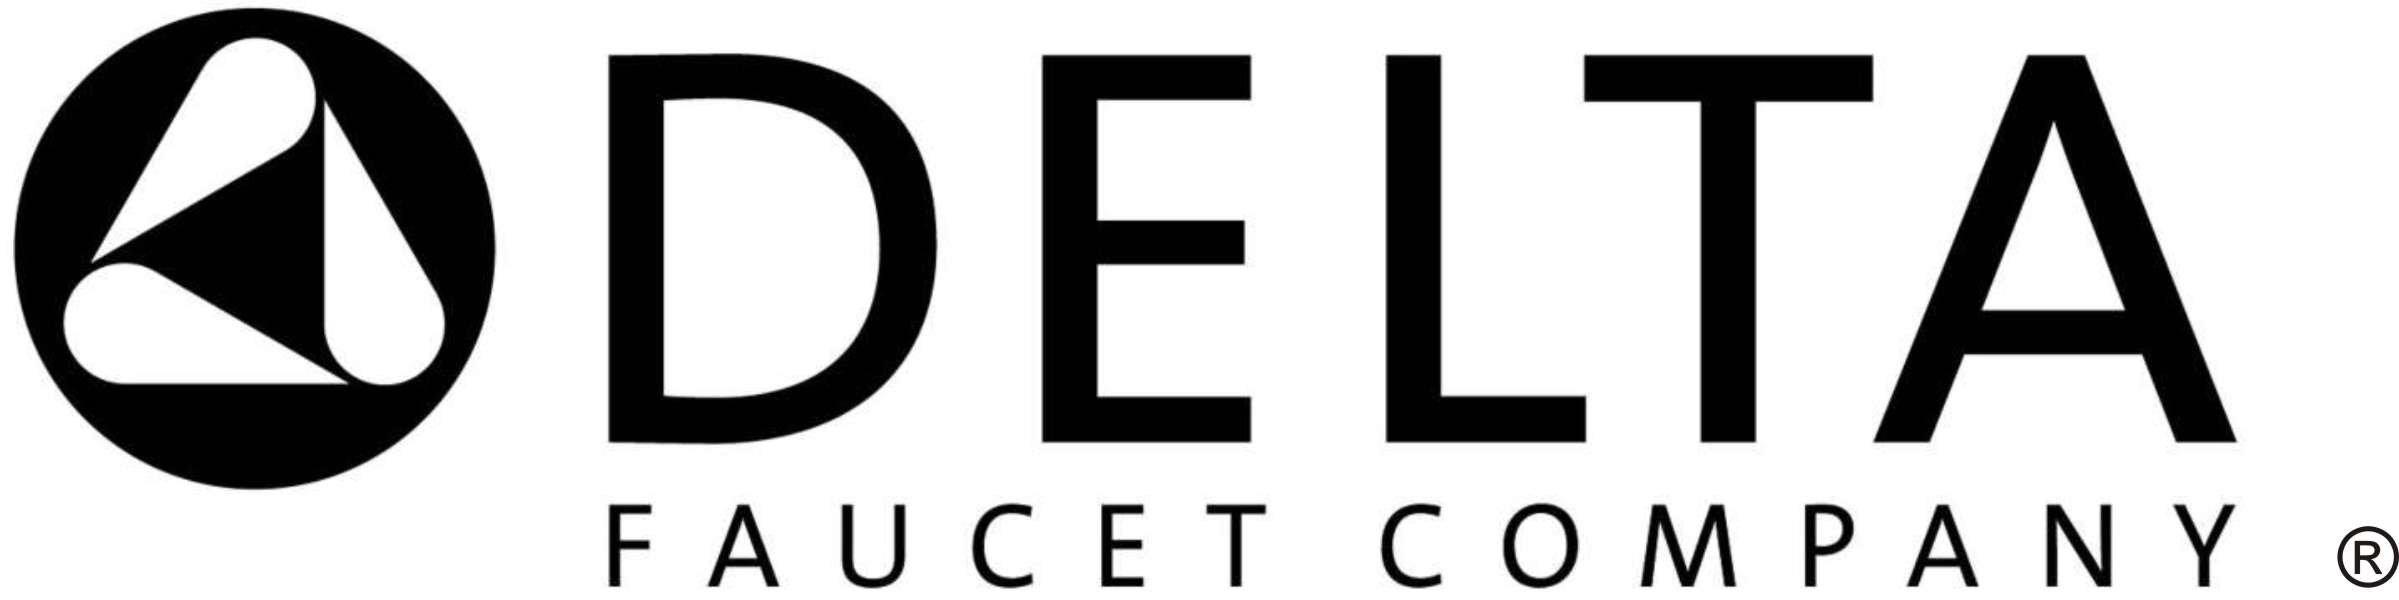 Delta RP71180WH Replacement Part by DELTA FAUCET